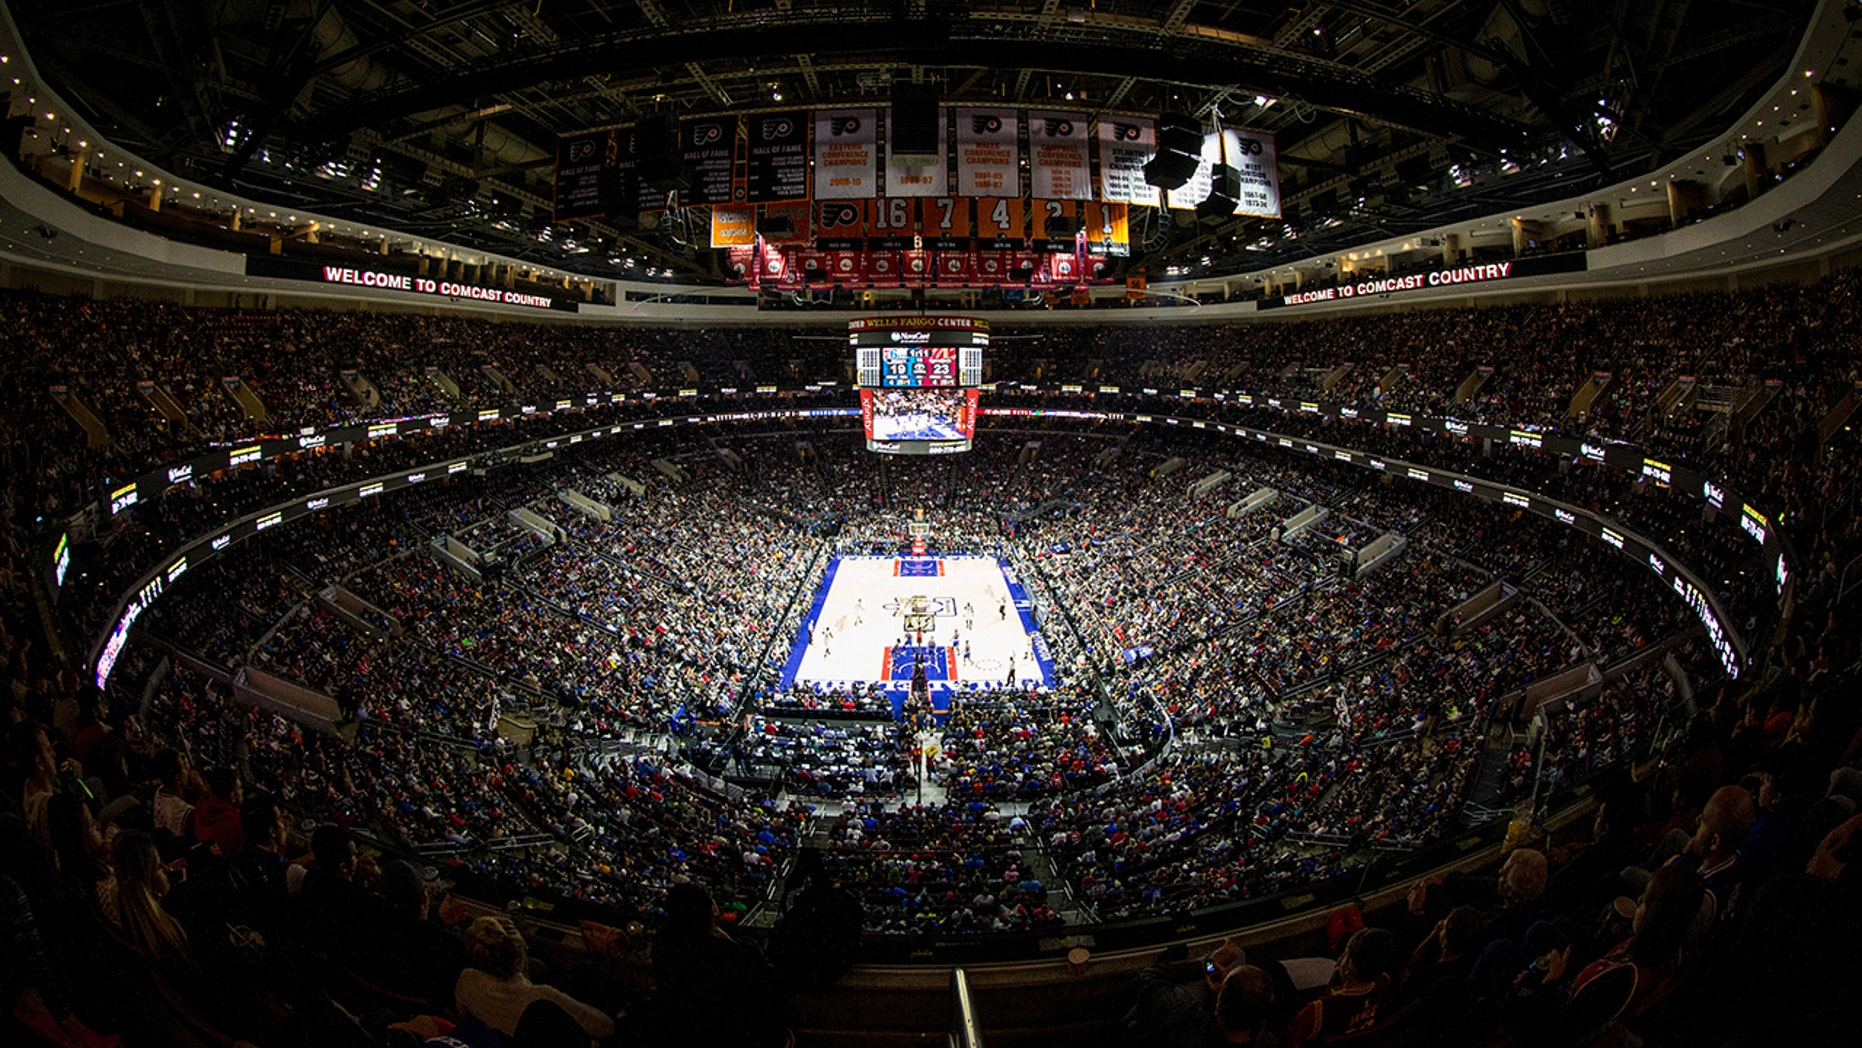 Philadelphia 76ers legend and Basketball Hall-of-Famer Hal Greer has died.